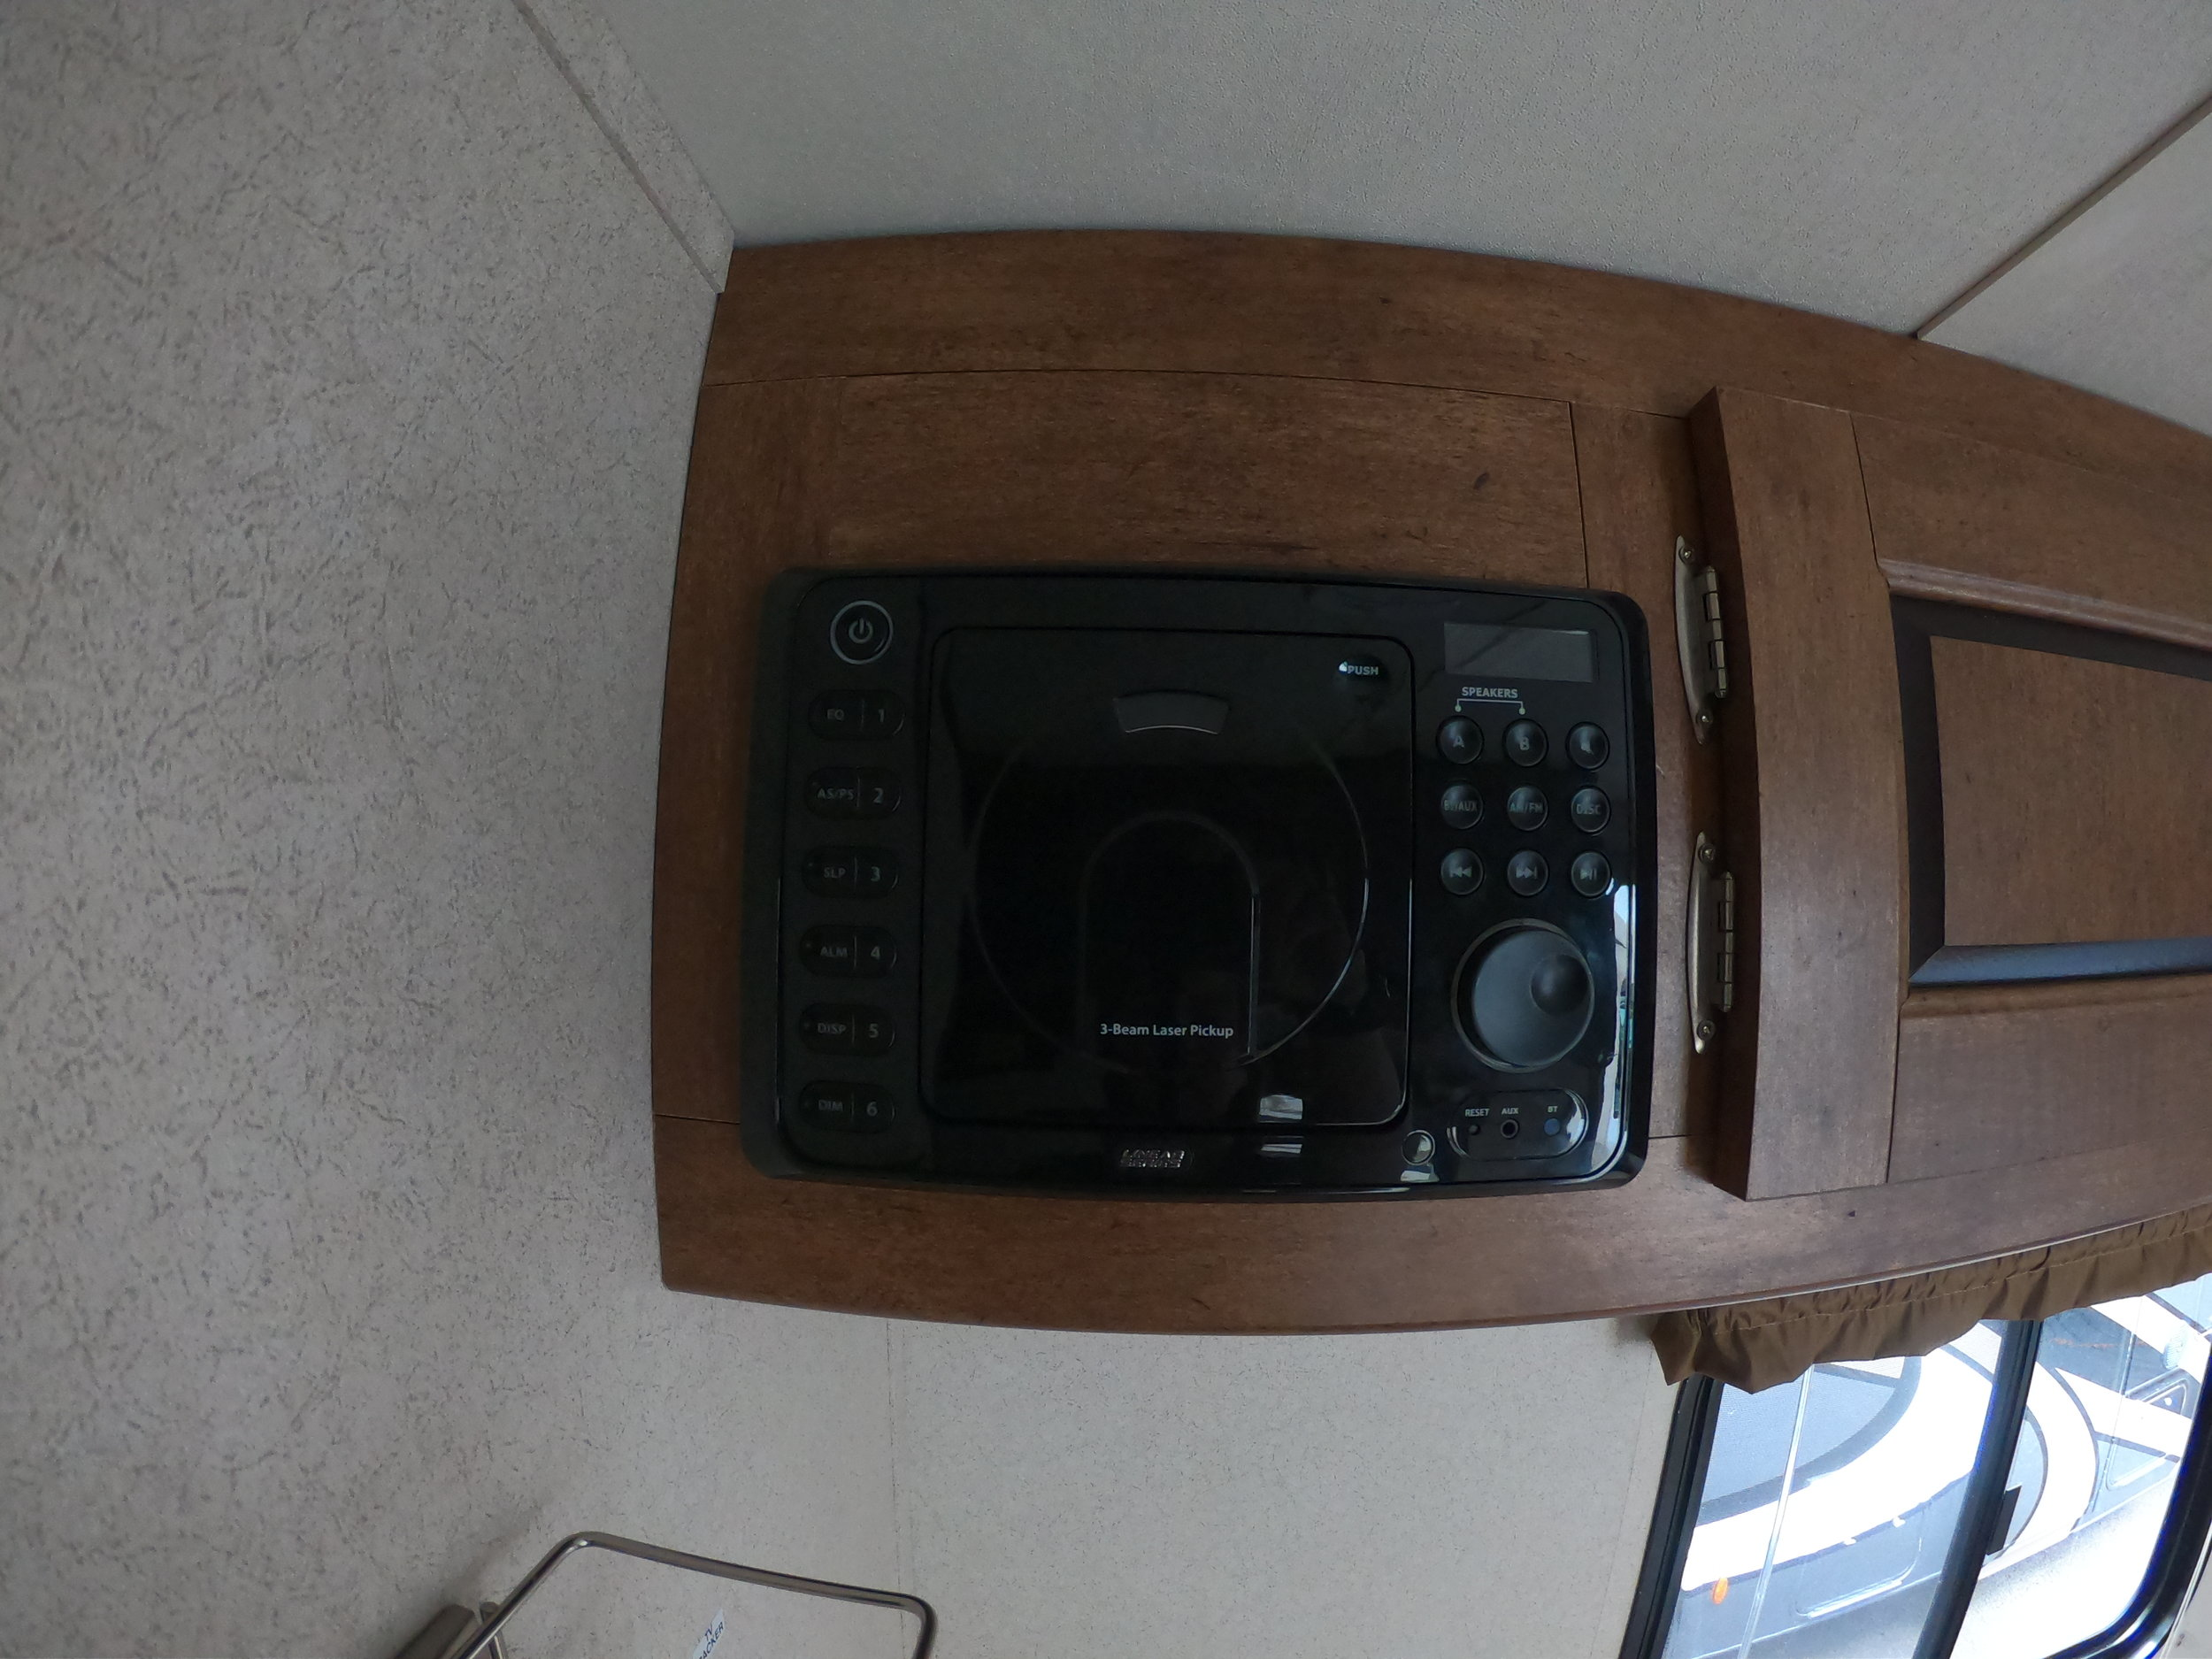 GOPR2480.JPG